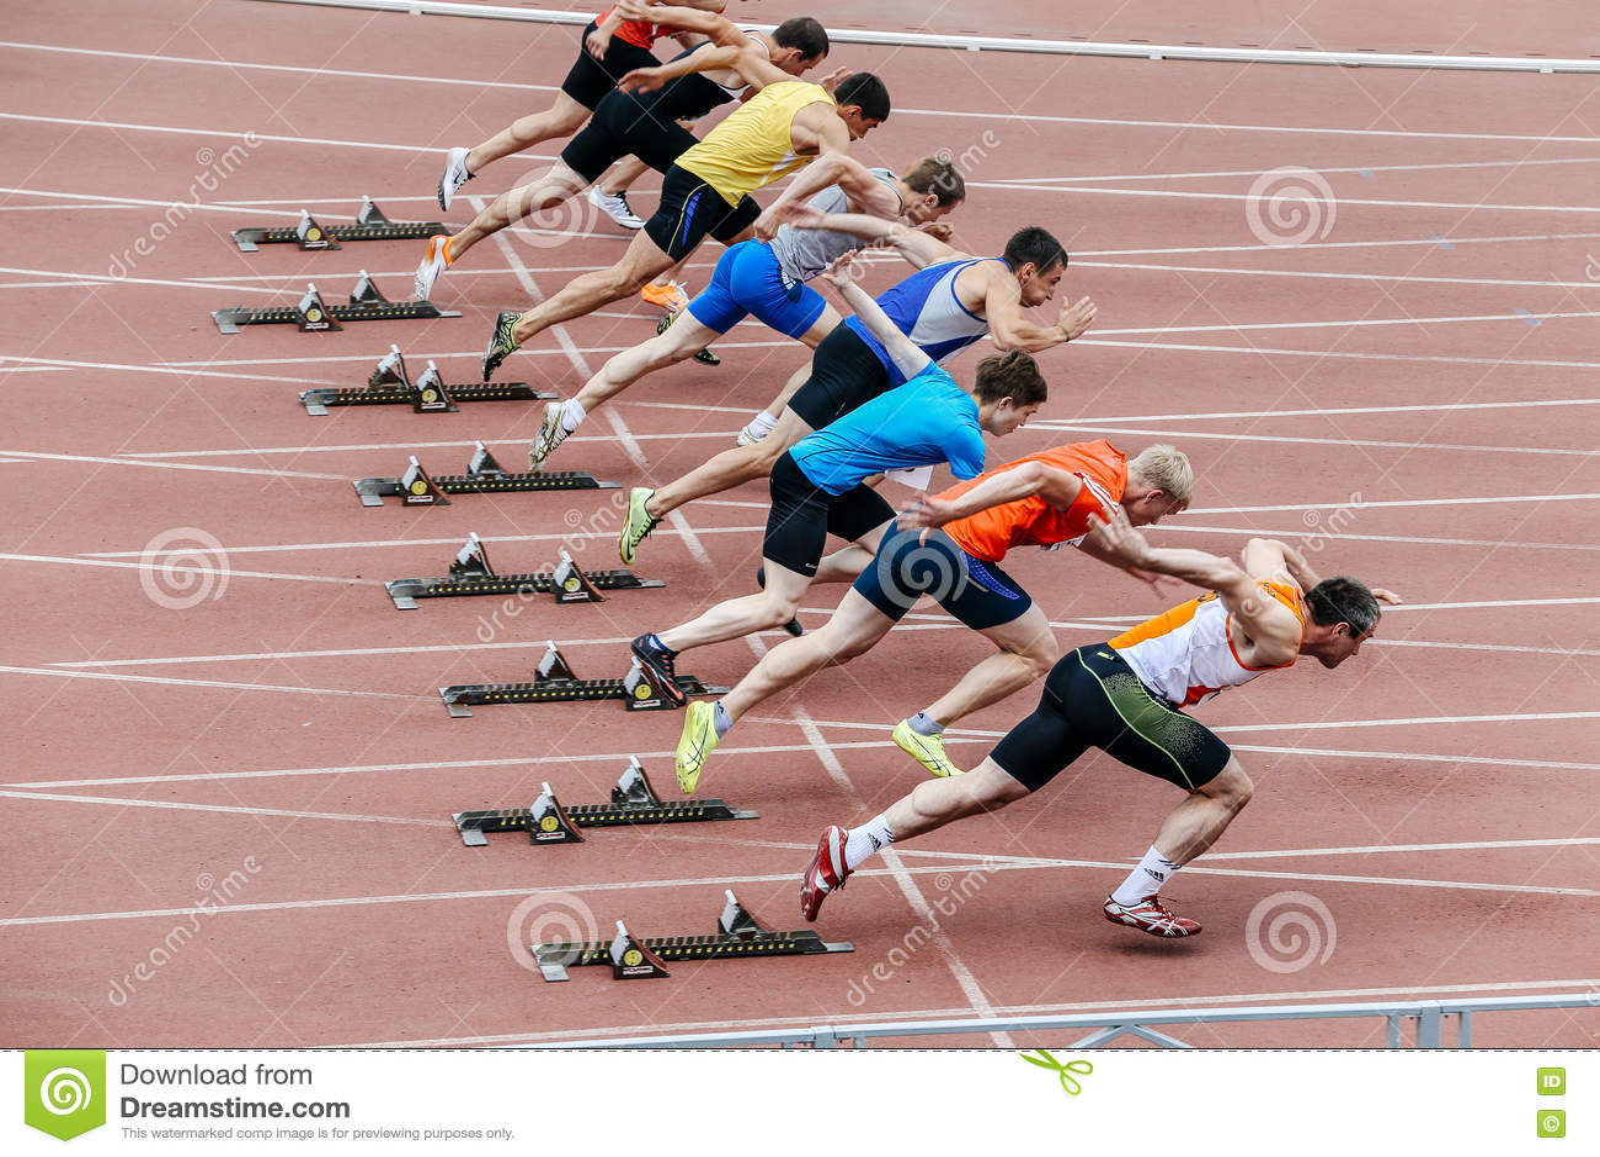 Start men athletes at sprint distance of 100 meters